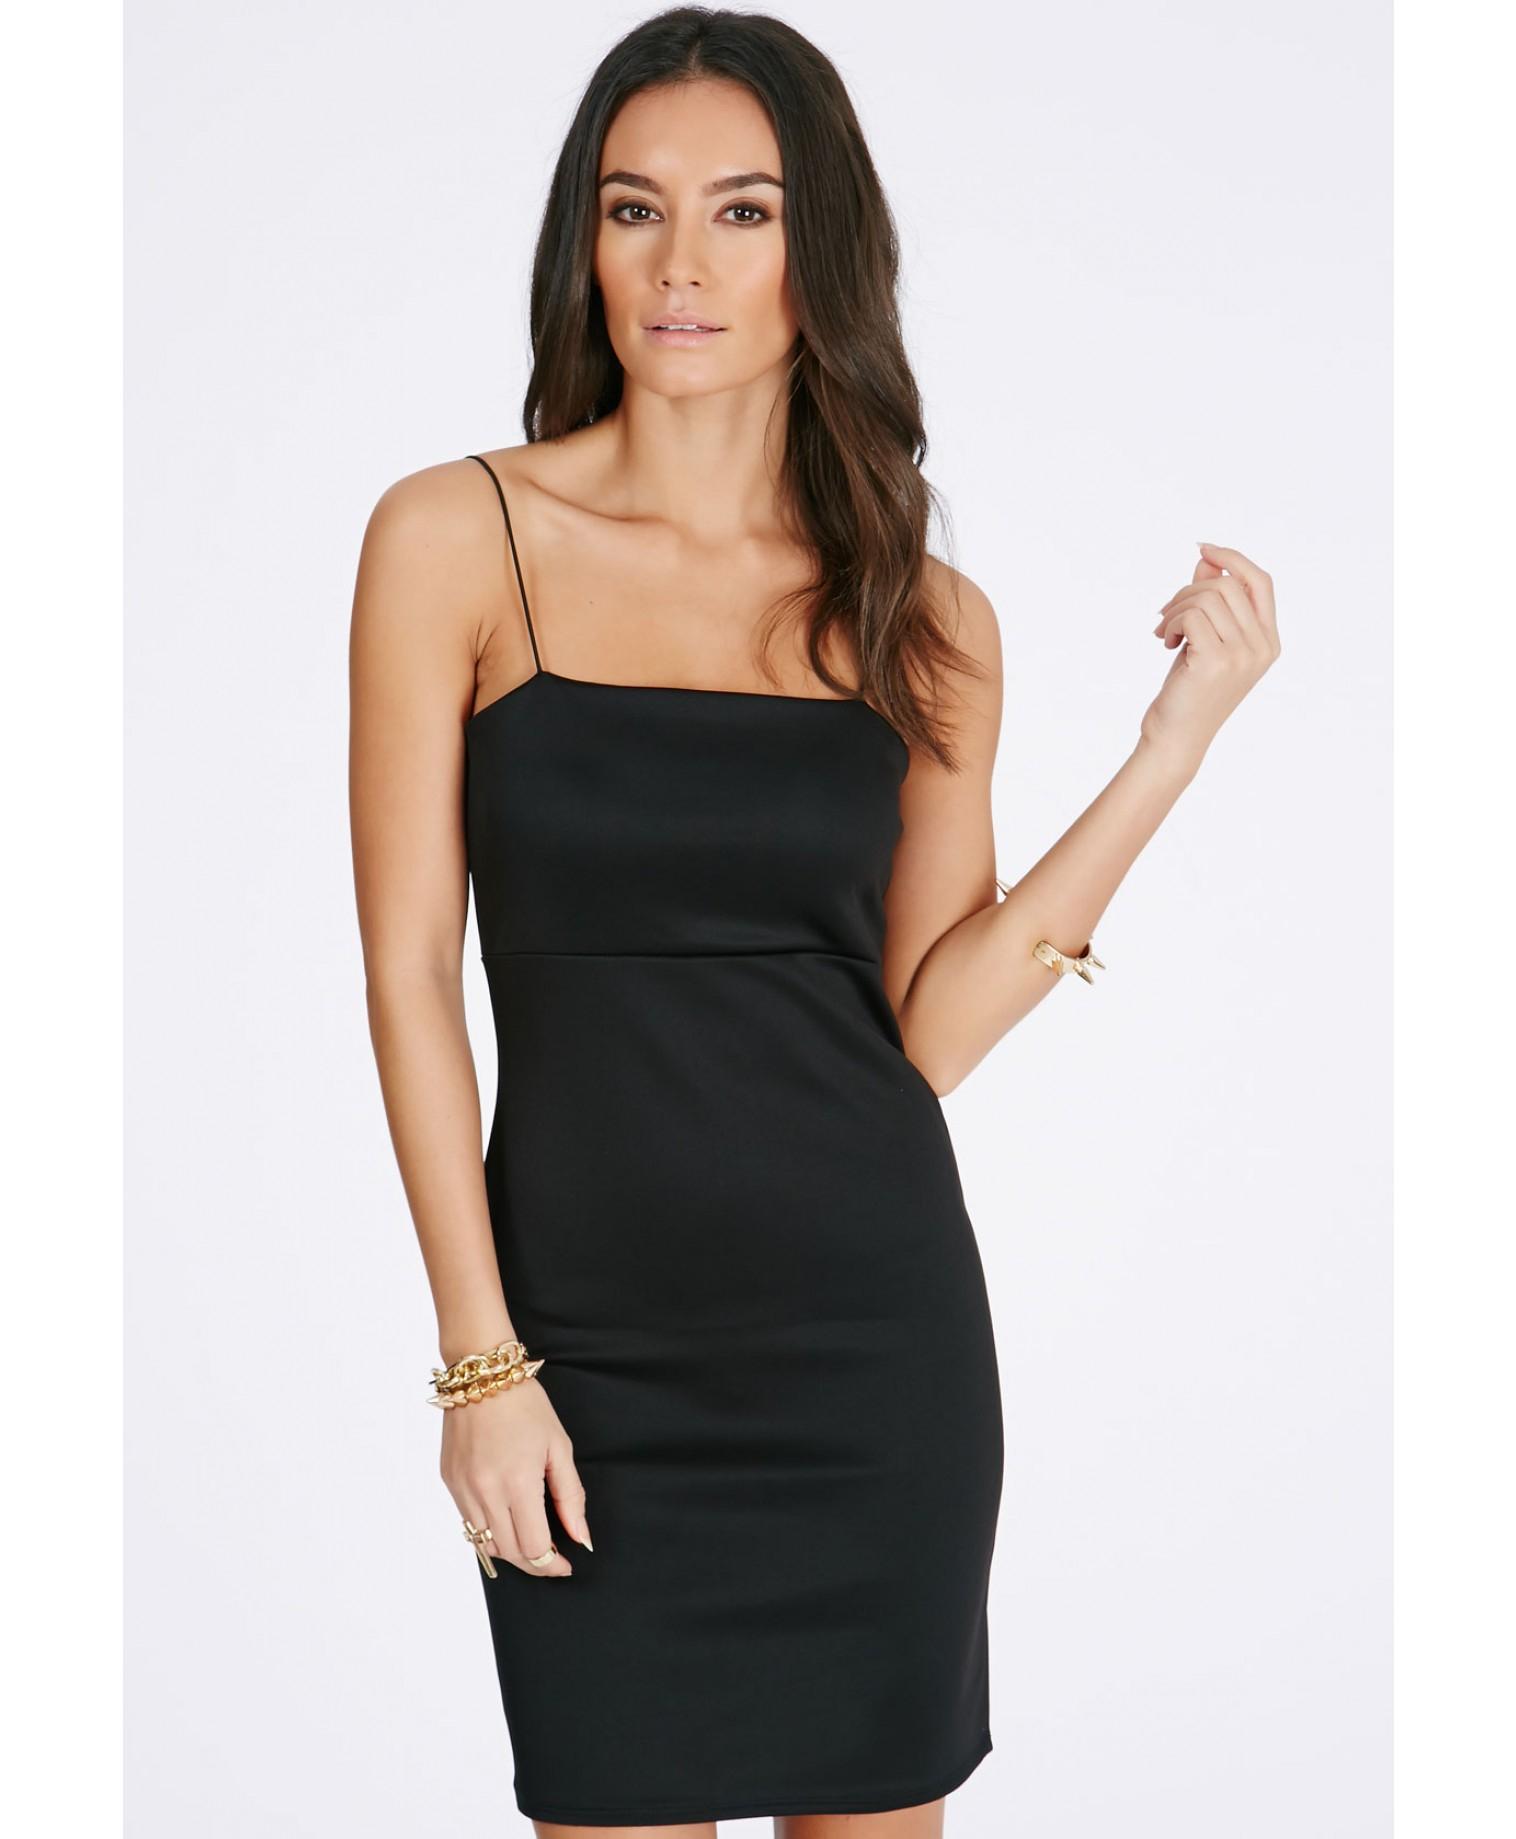 392c451df5e79 Missguided Clauda Bodycon Cami Slip Dress In Black in Black - Lyst